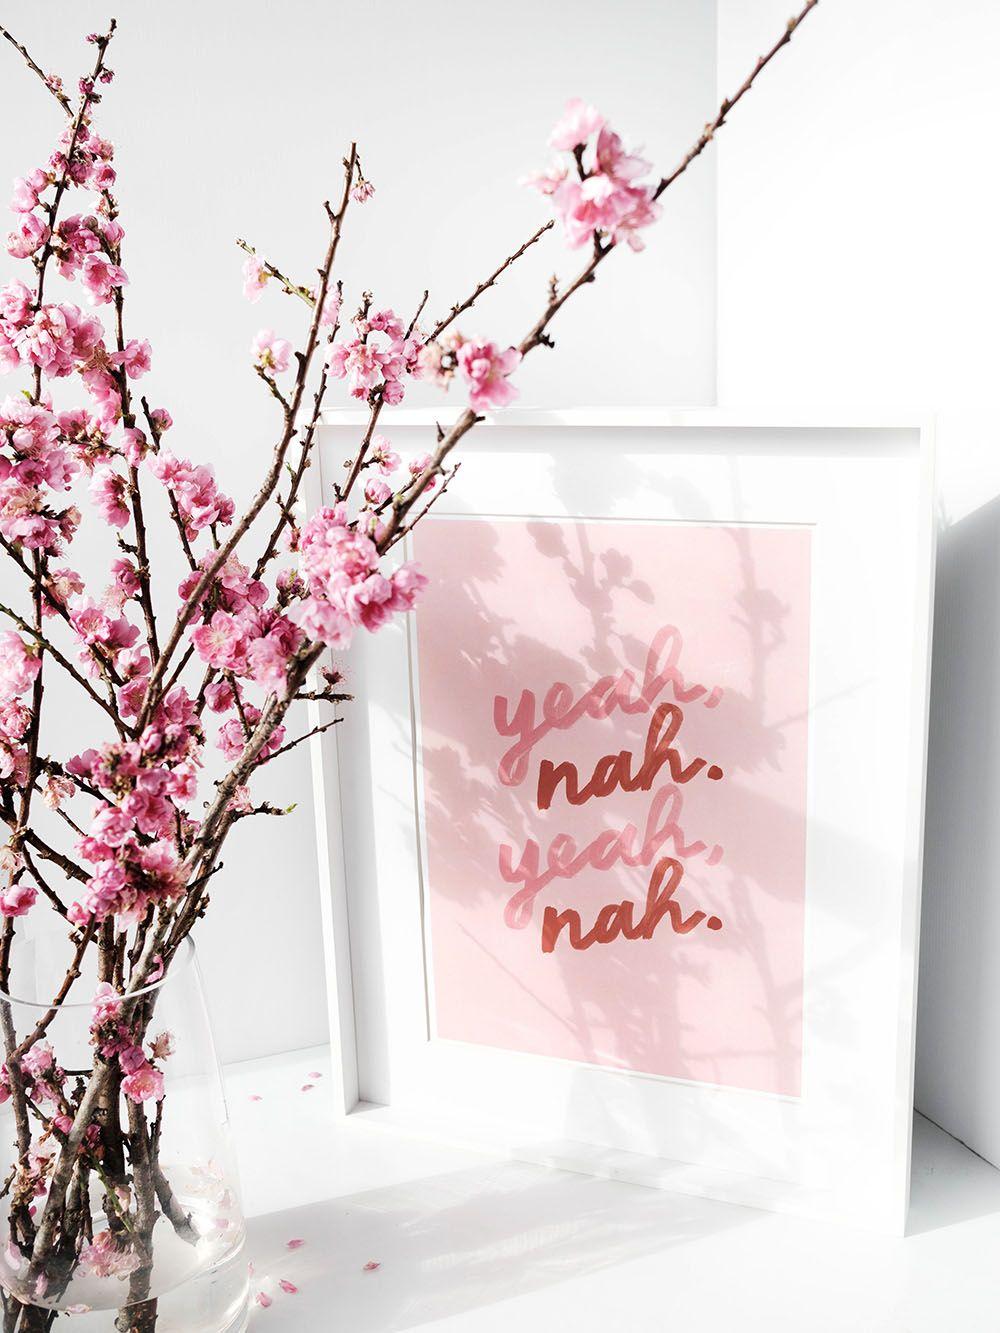 DSCF9050small.jpg Print, Flower decorations, Interior